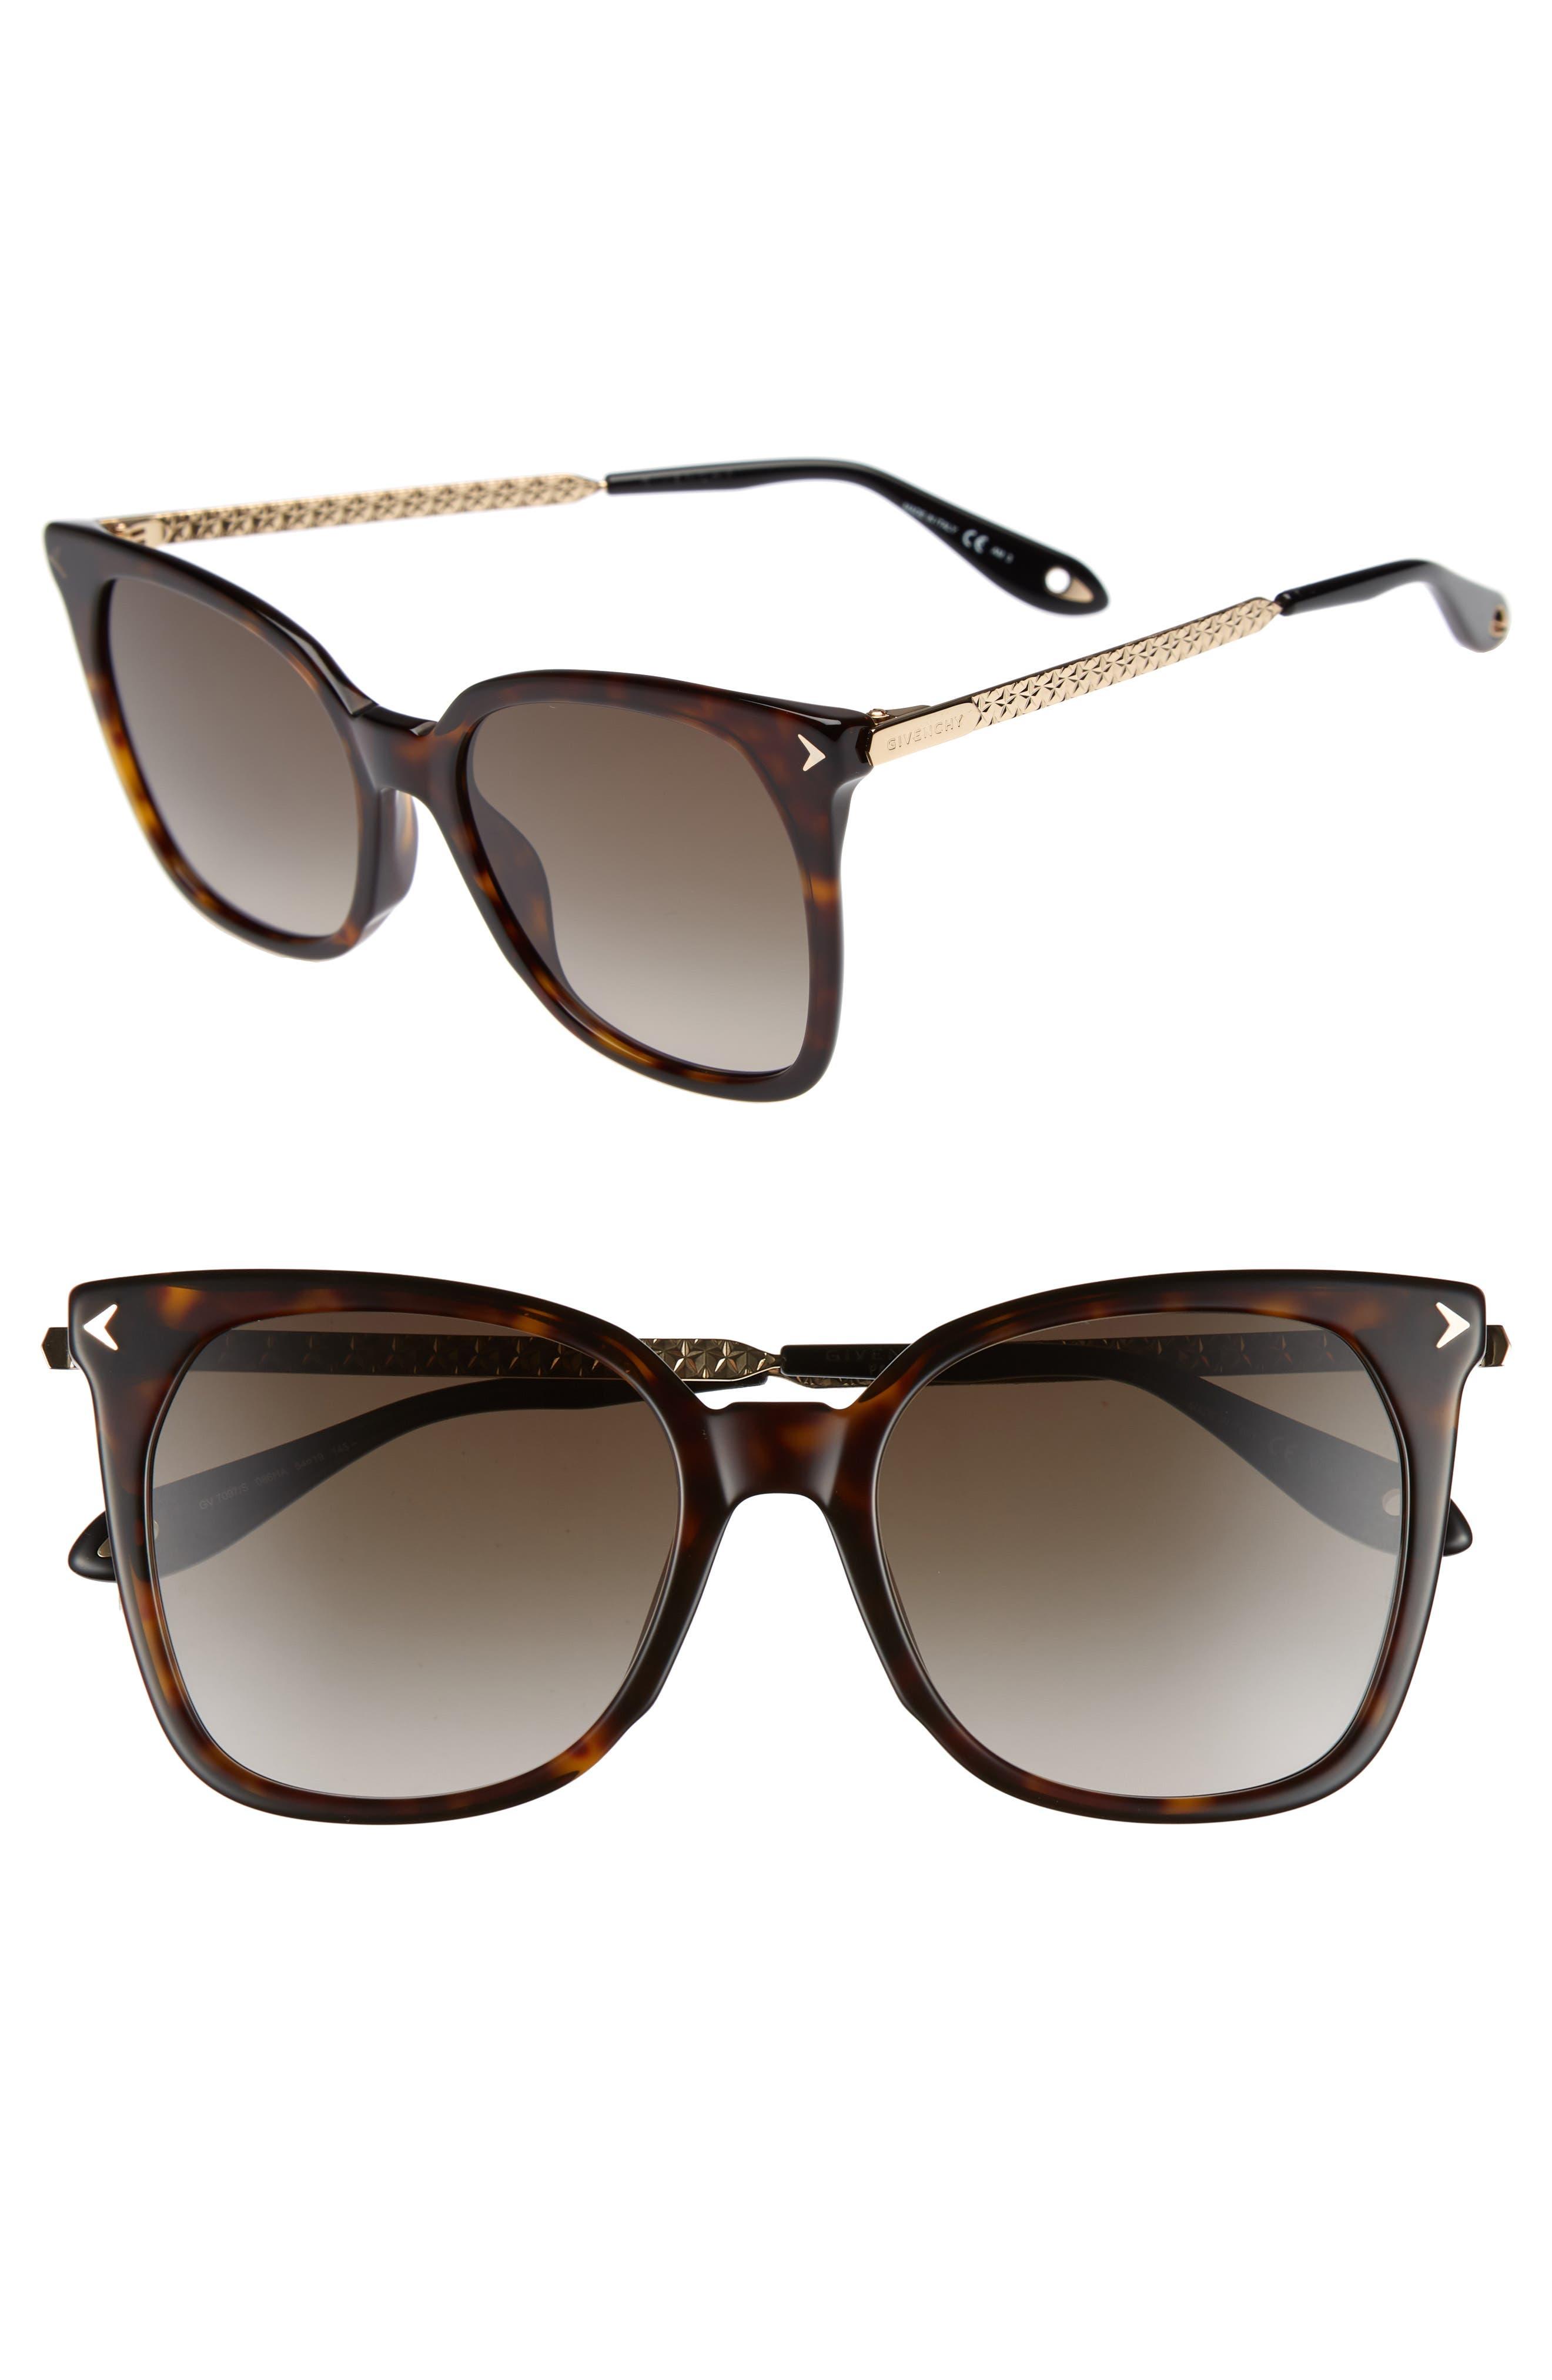 54mm Square Sunglasses,                             Main thumbnail 1, color,                             Dark Havana